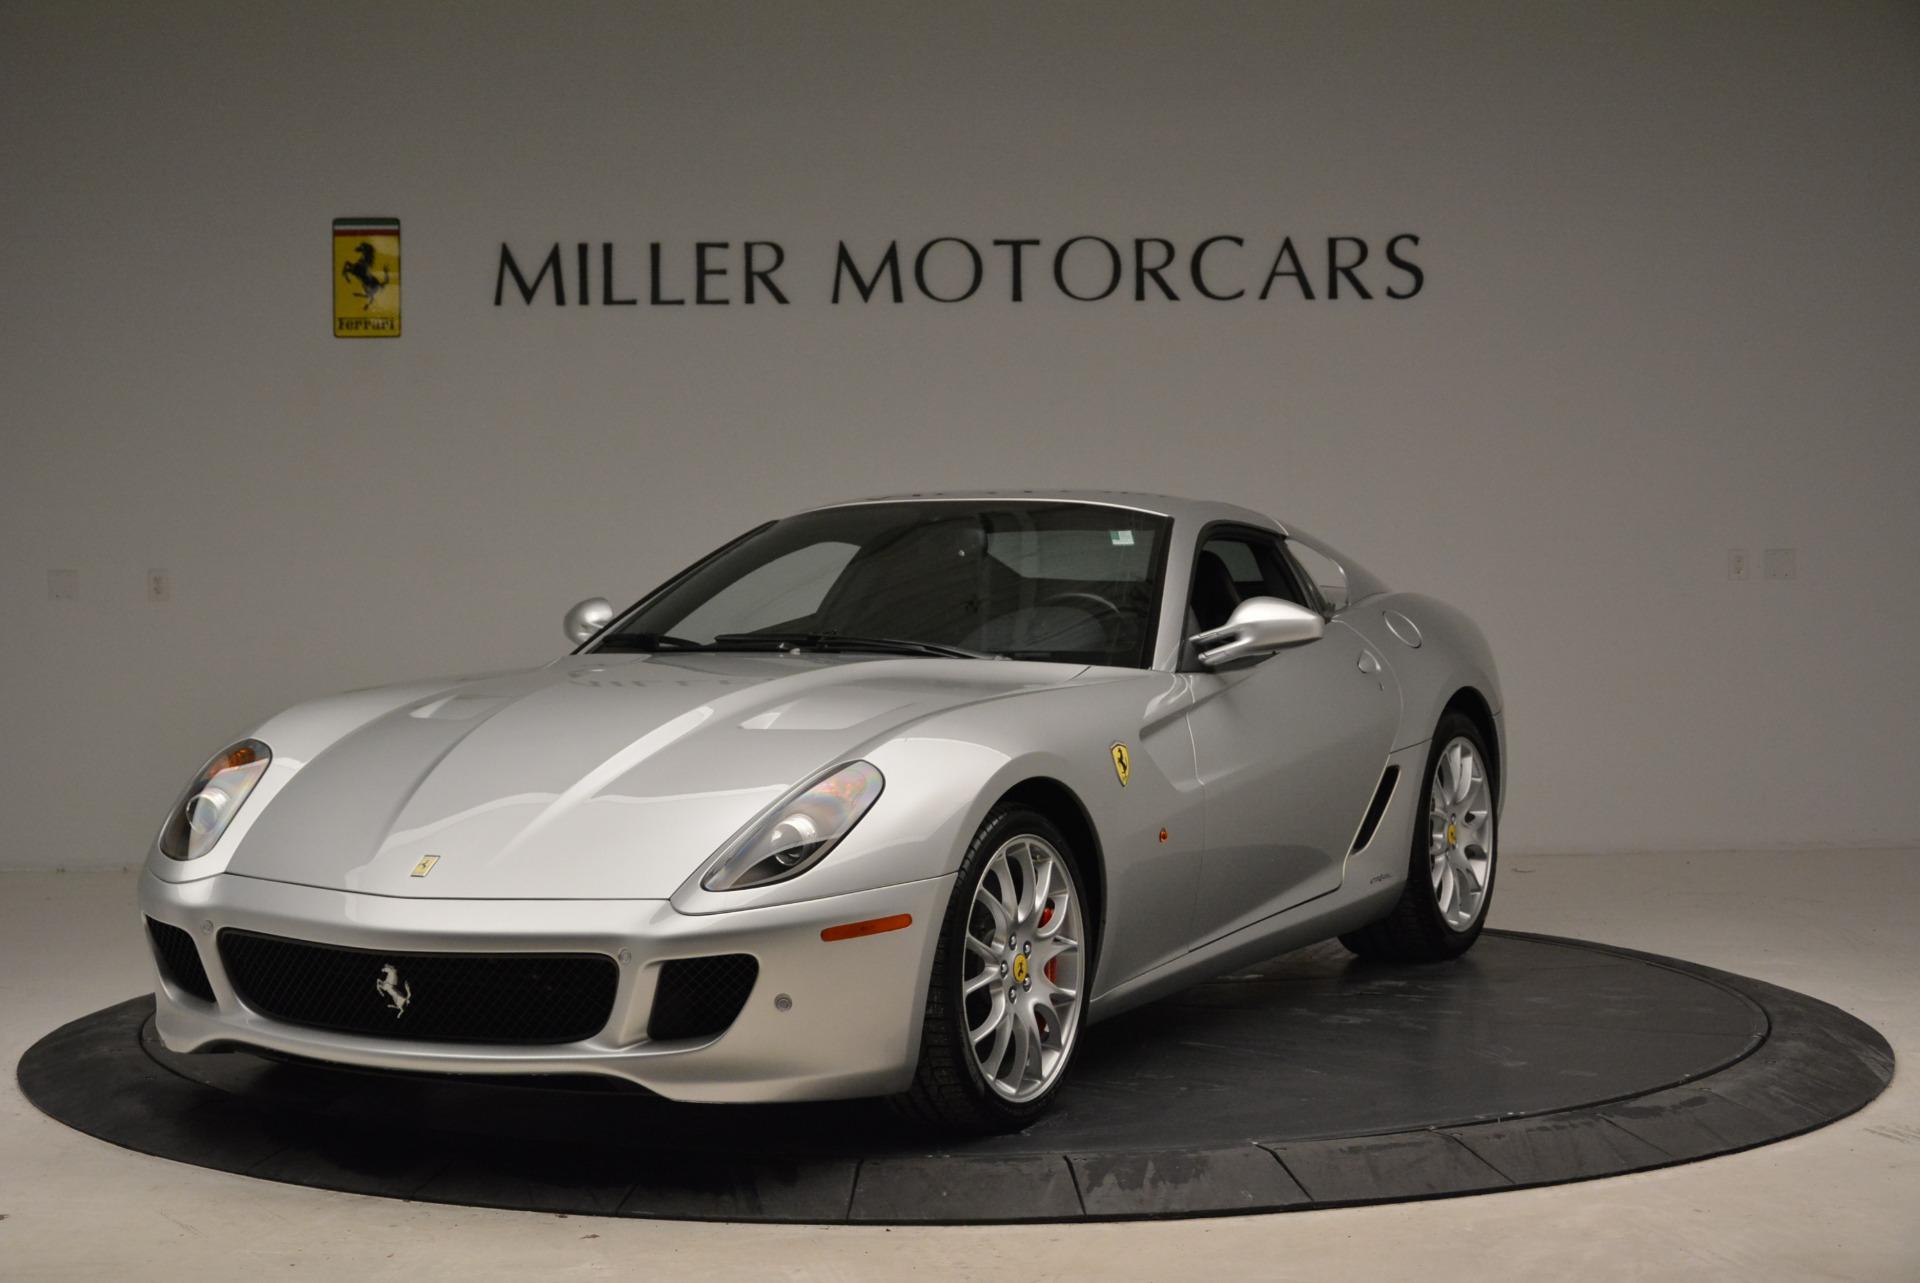 Used 2010 Ferrari 599 GTB Fiorano for sale $162,900 at Rolls-Royce Motor Cars Greenwich in Greenwich CT 06830 1